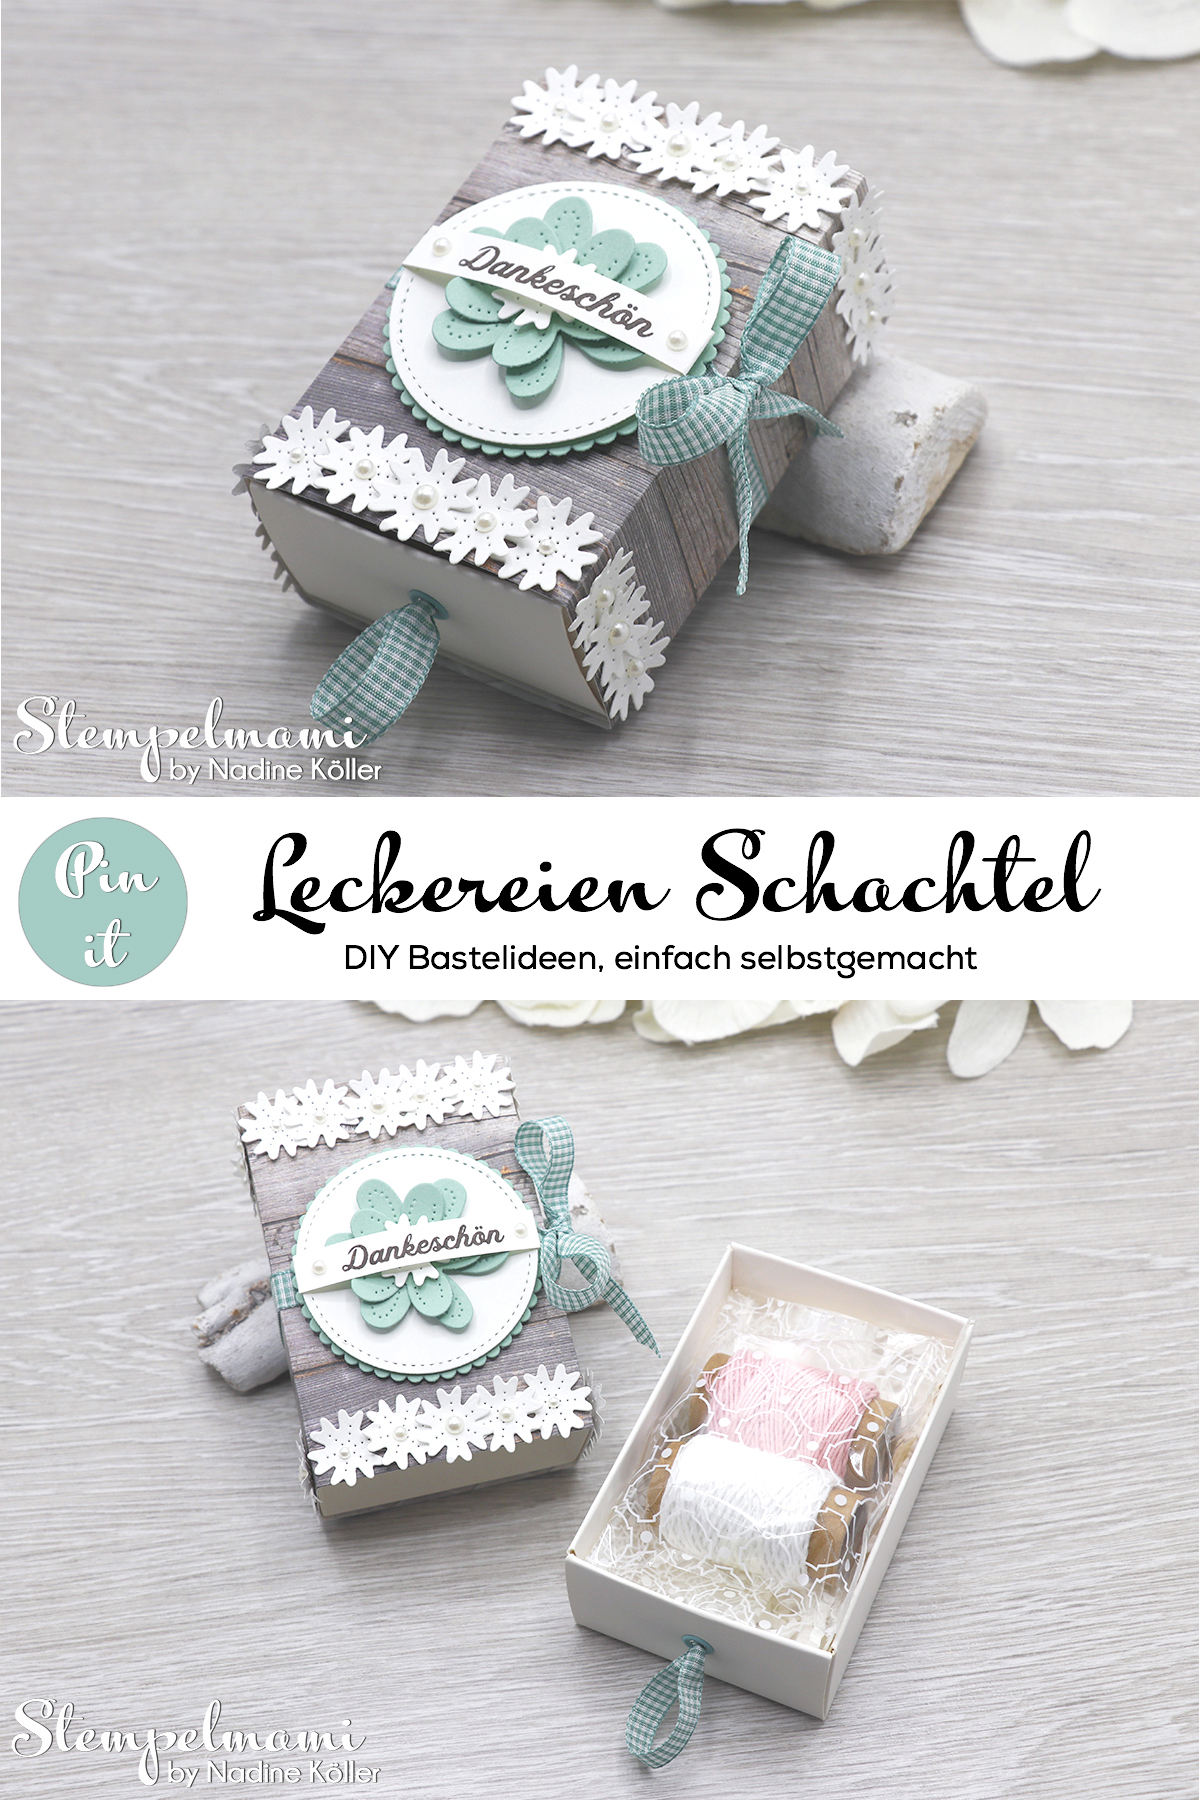 Stampin Up Leckereien Schachtel Blumen verziert Matchbox Stempelmami Instagram 9